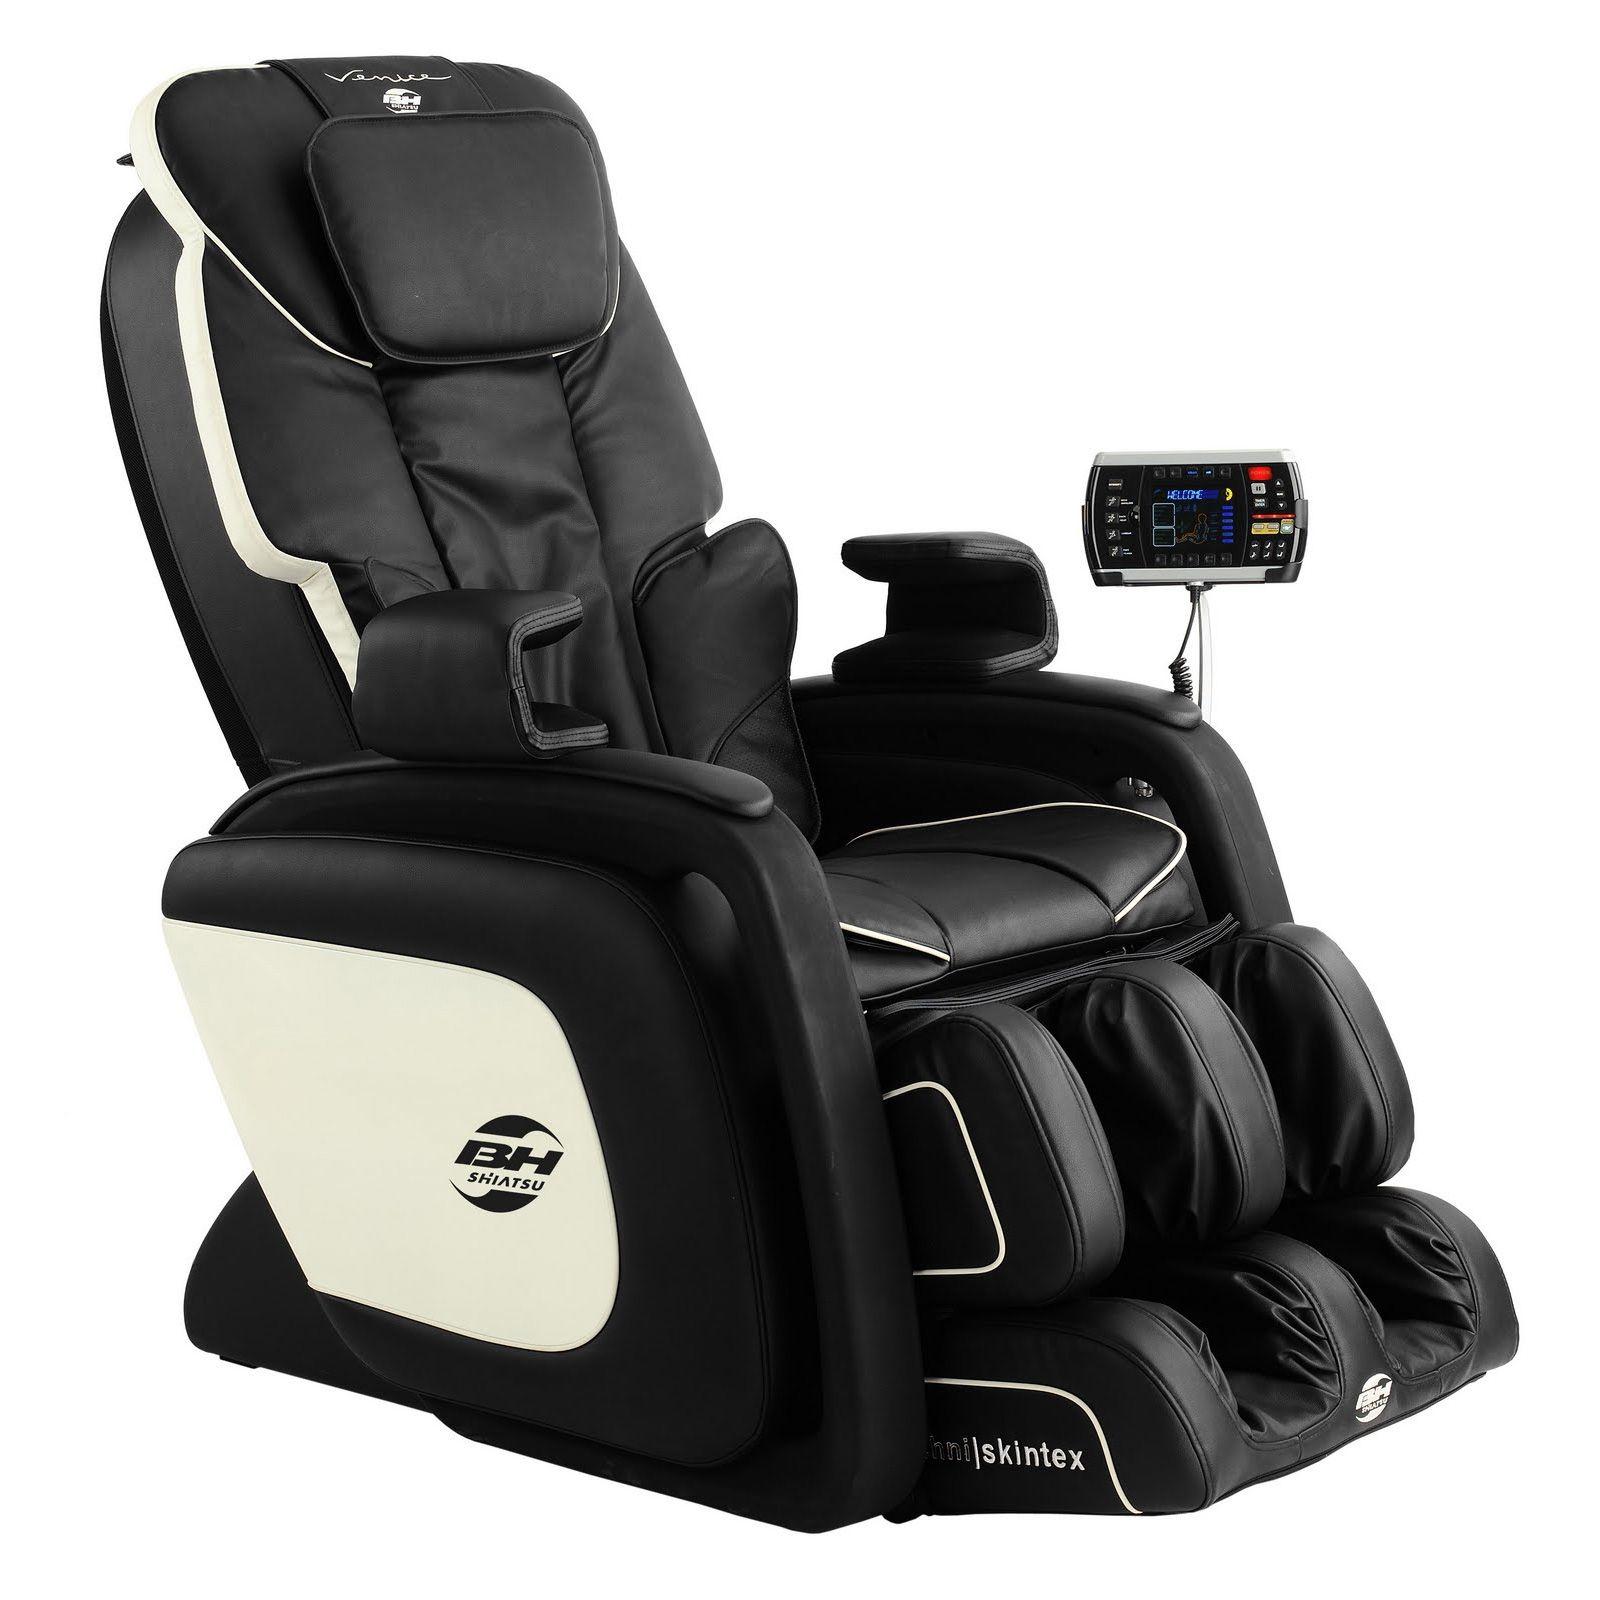 bh shiatsu m650 venice massage chair. Black Bedroom Furniture Sets. Home Design Ideas